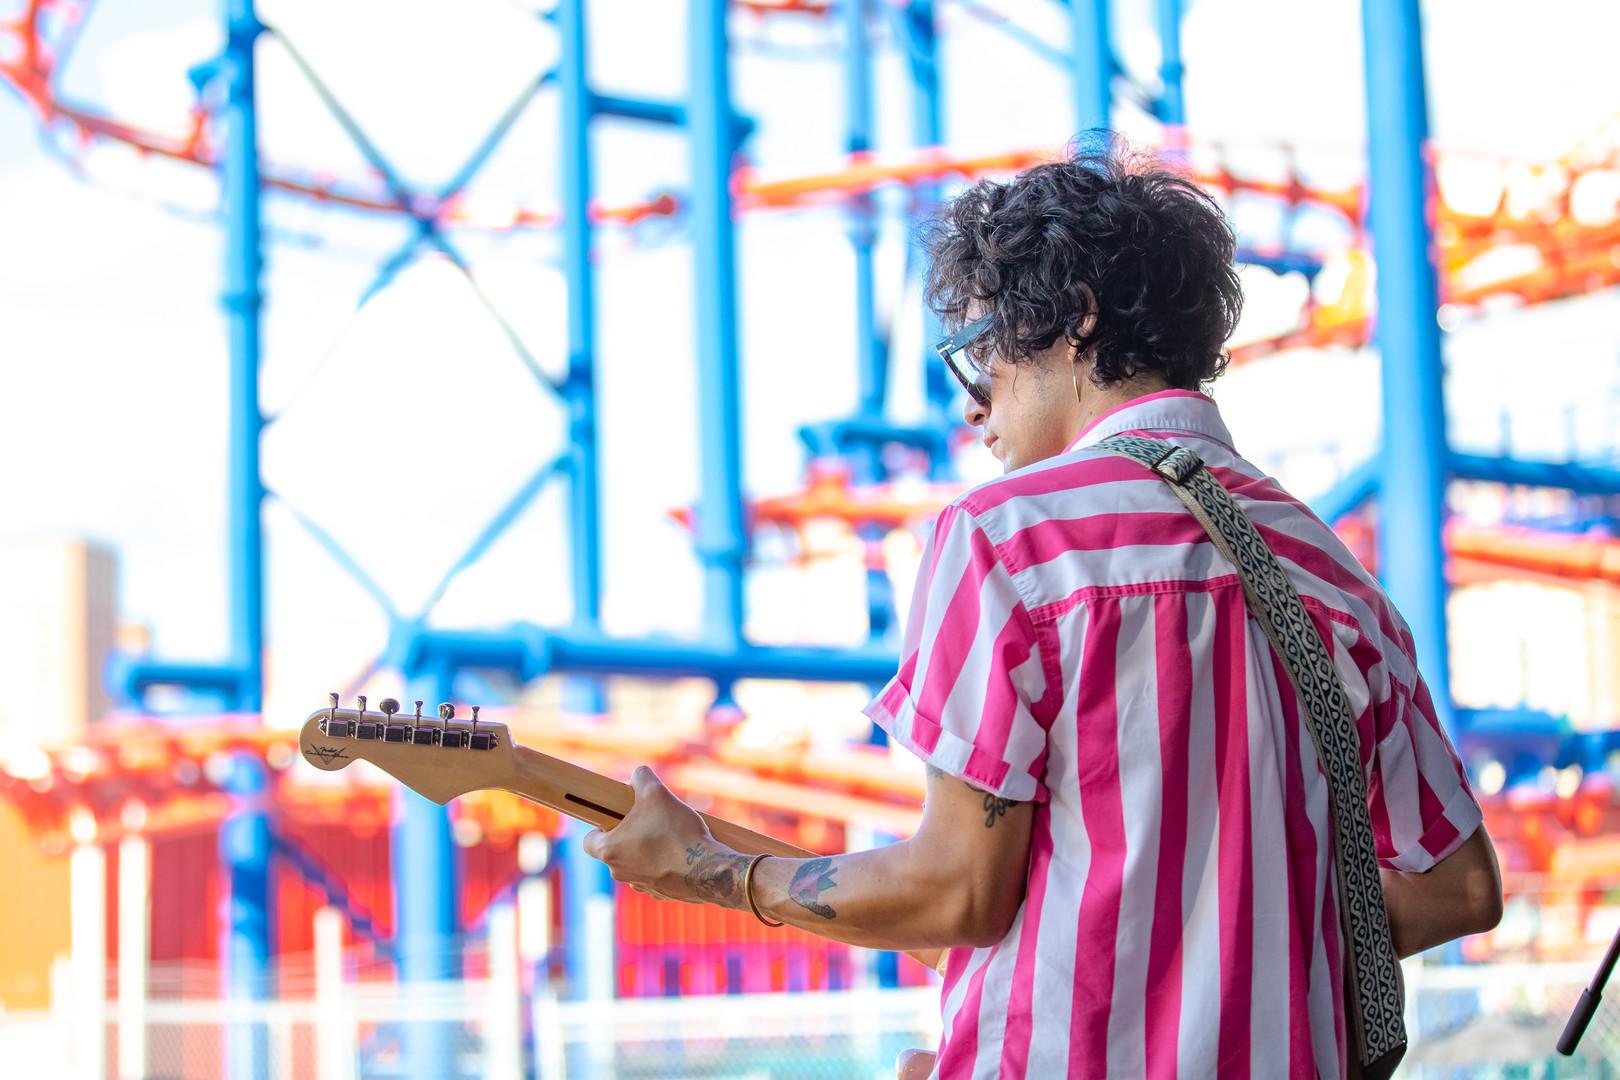 Coney Island Music Festival (Image)-245.